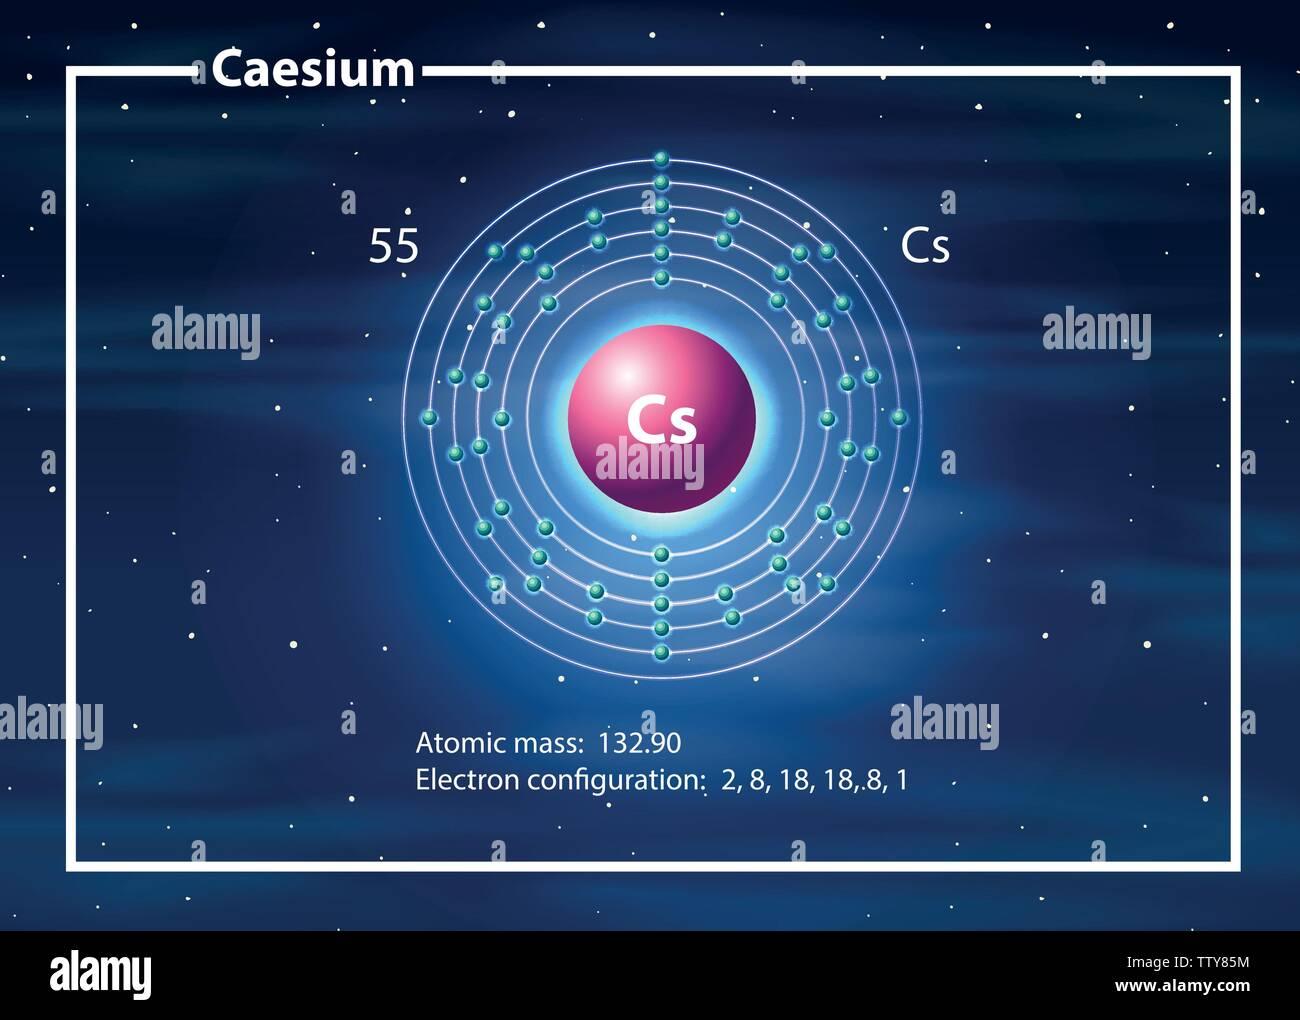 Chemist atom of Caesium diagram illustration - Stock Image